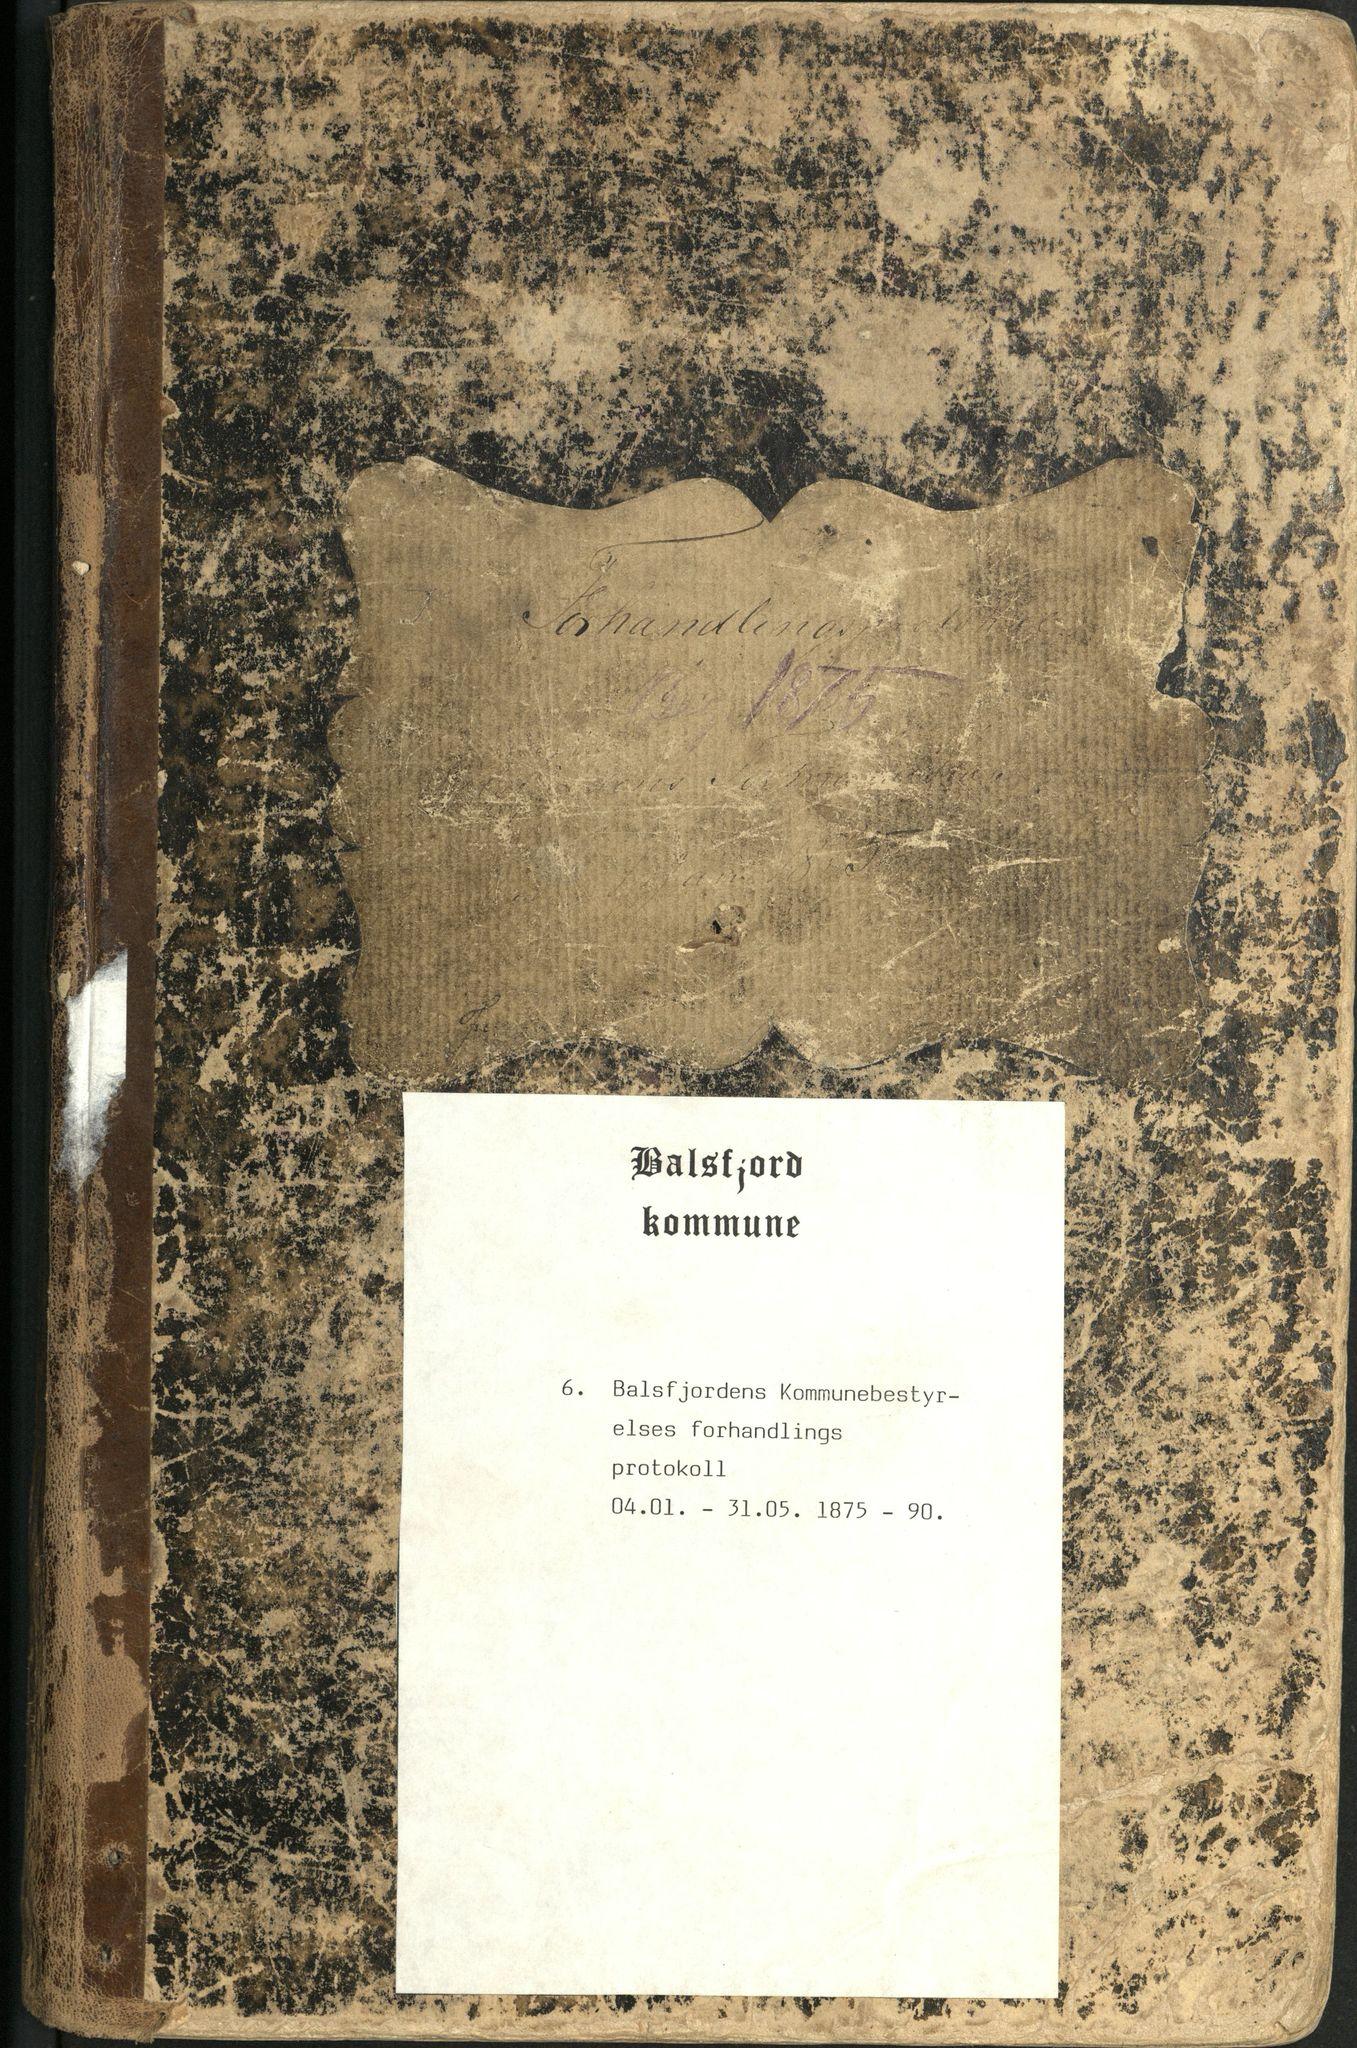 AT, Balsfjord kommune, -: Balsfjord kommunestyre, forhandlingsprotokoll, 1875-1890